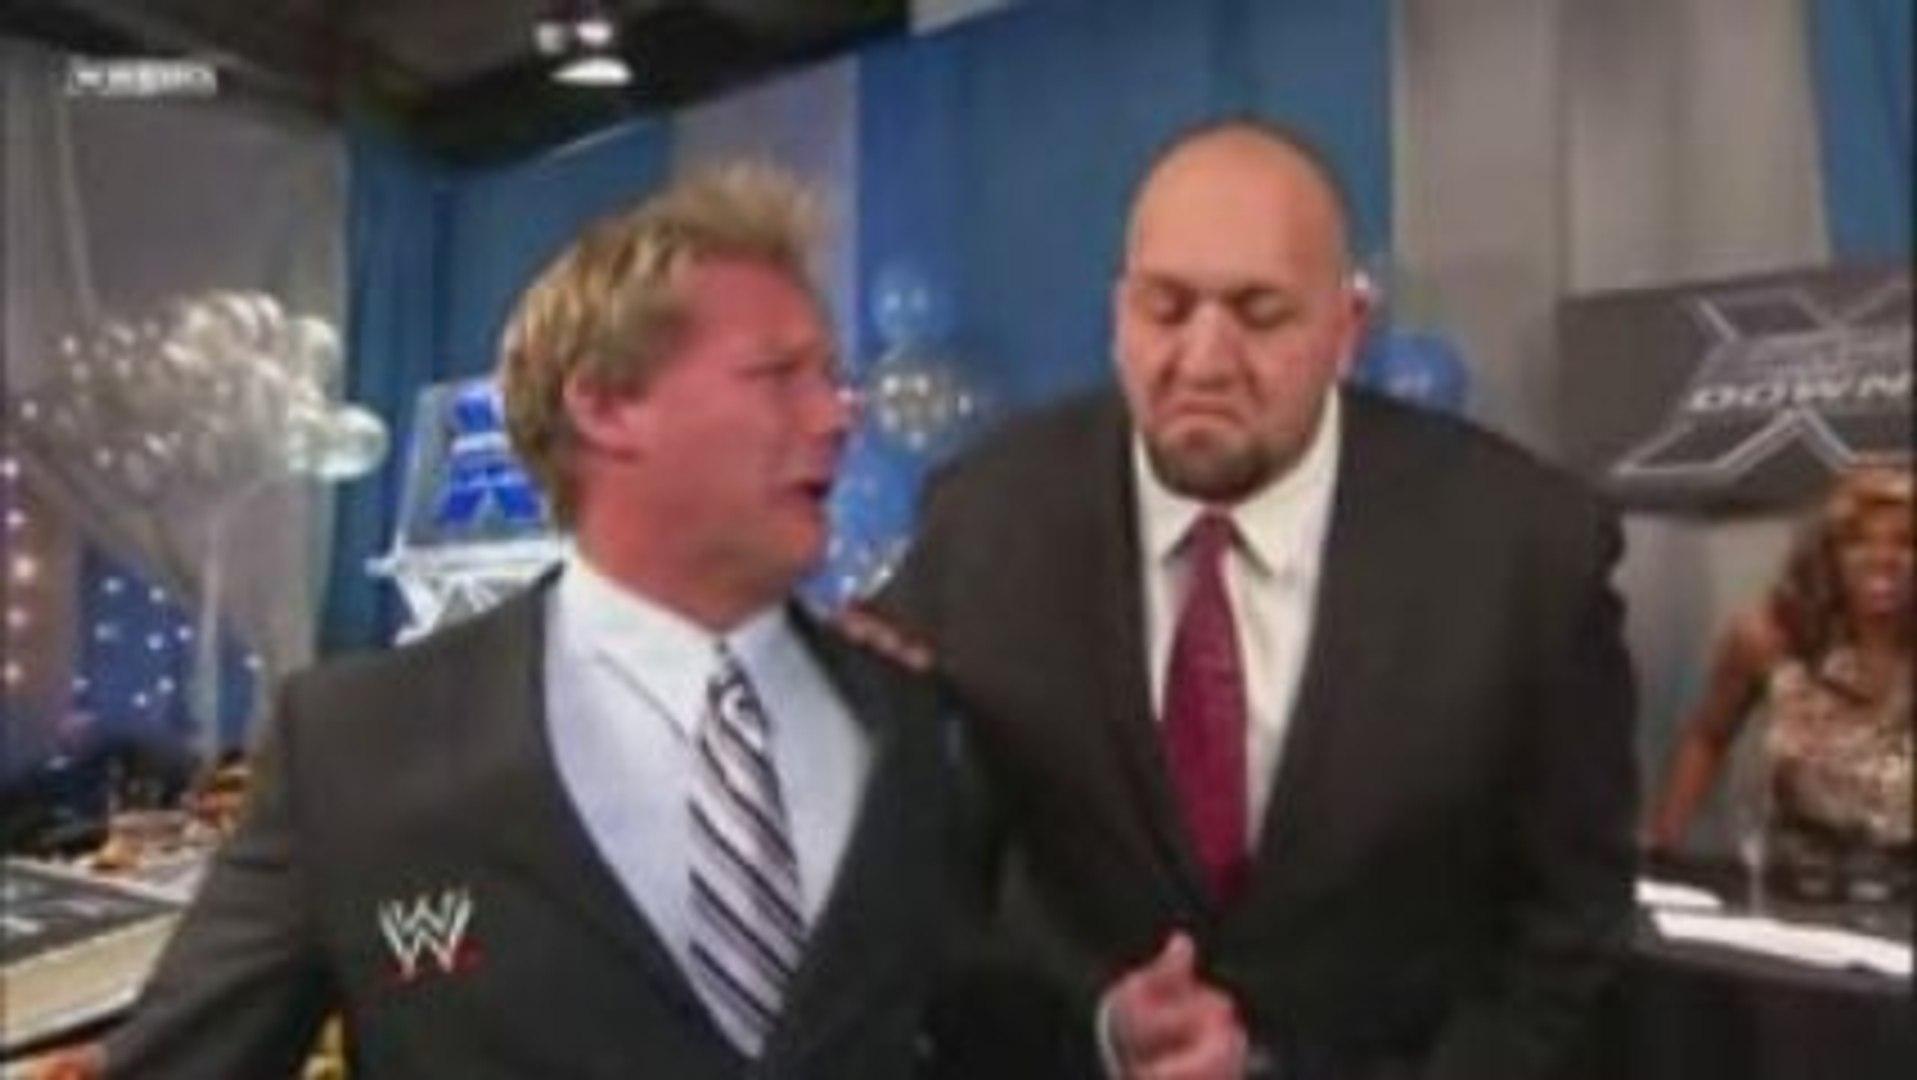 Funny segment on Smackdown 10/02/09